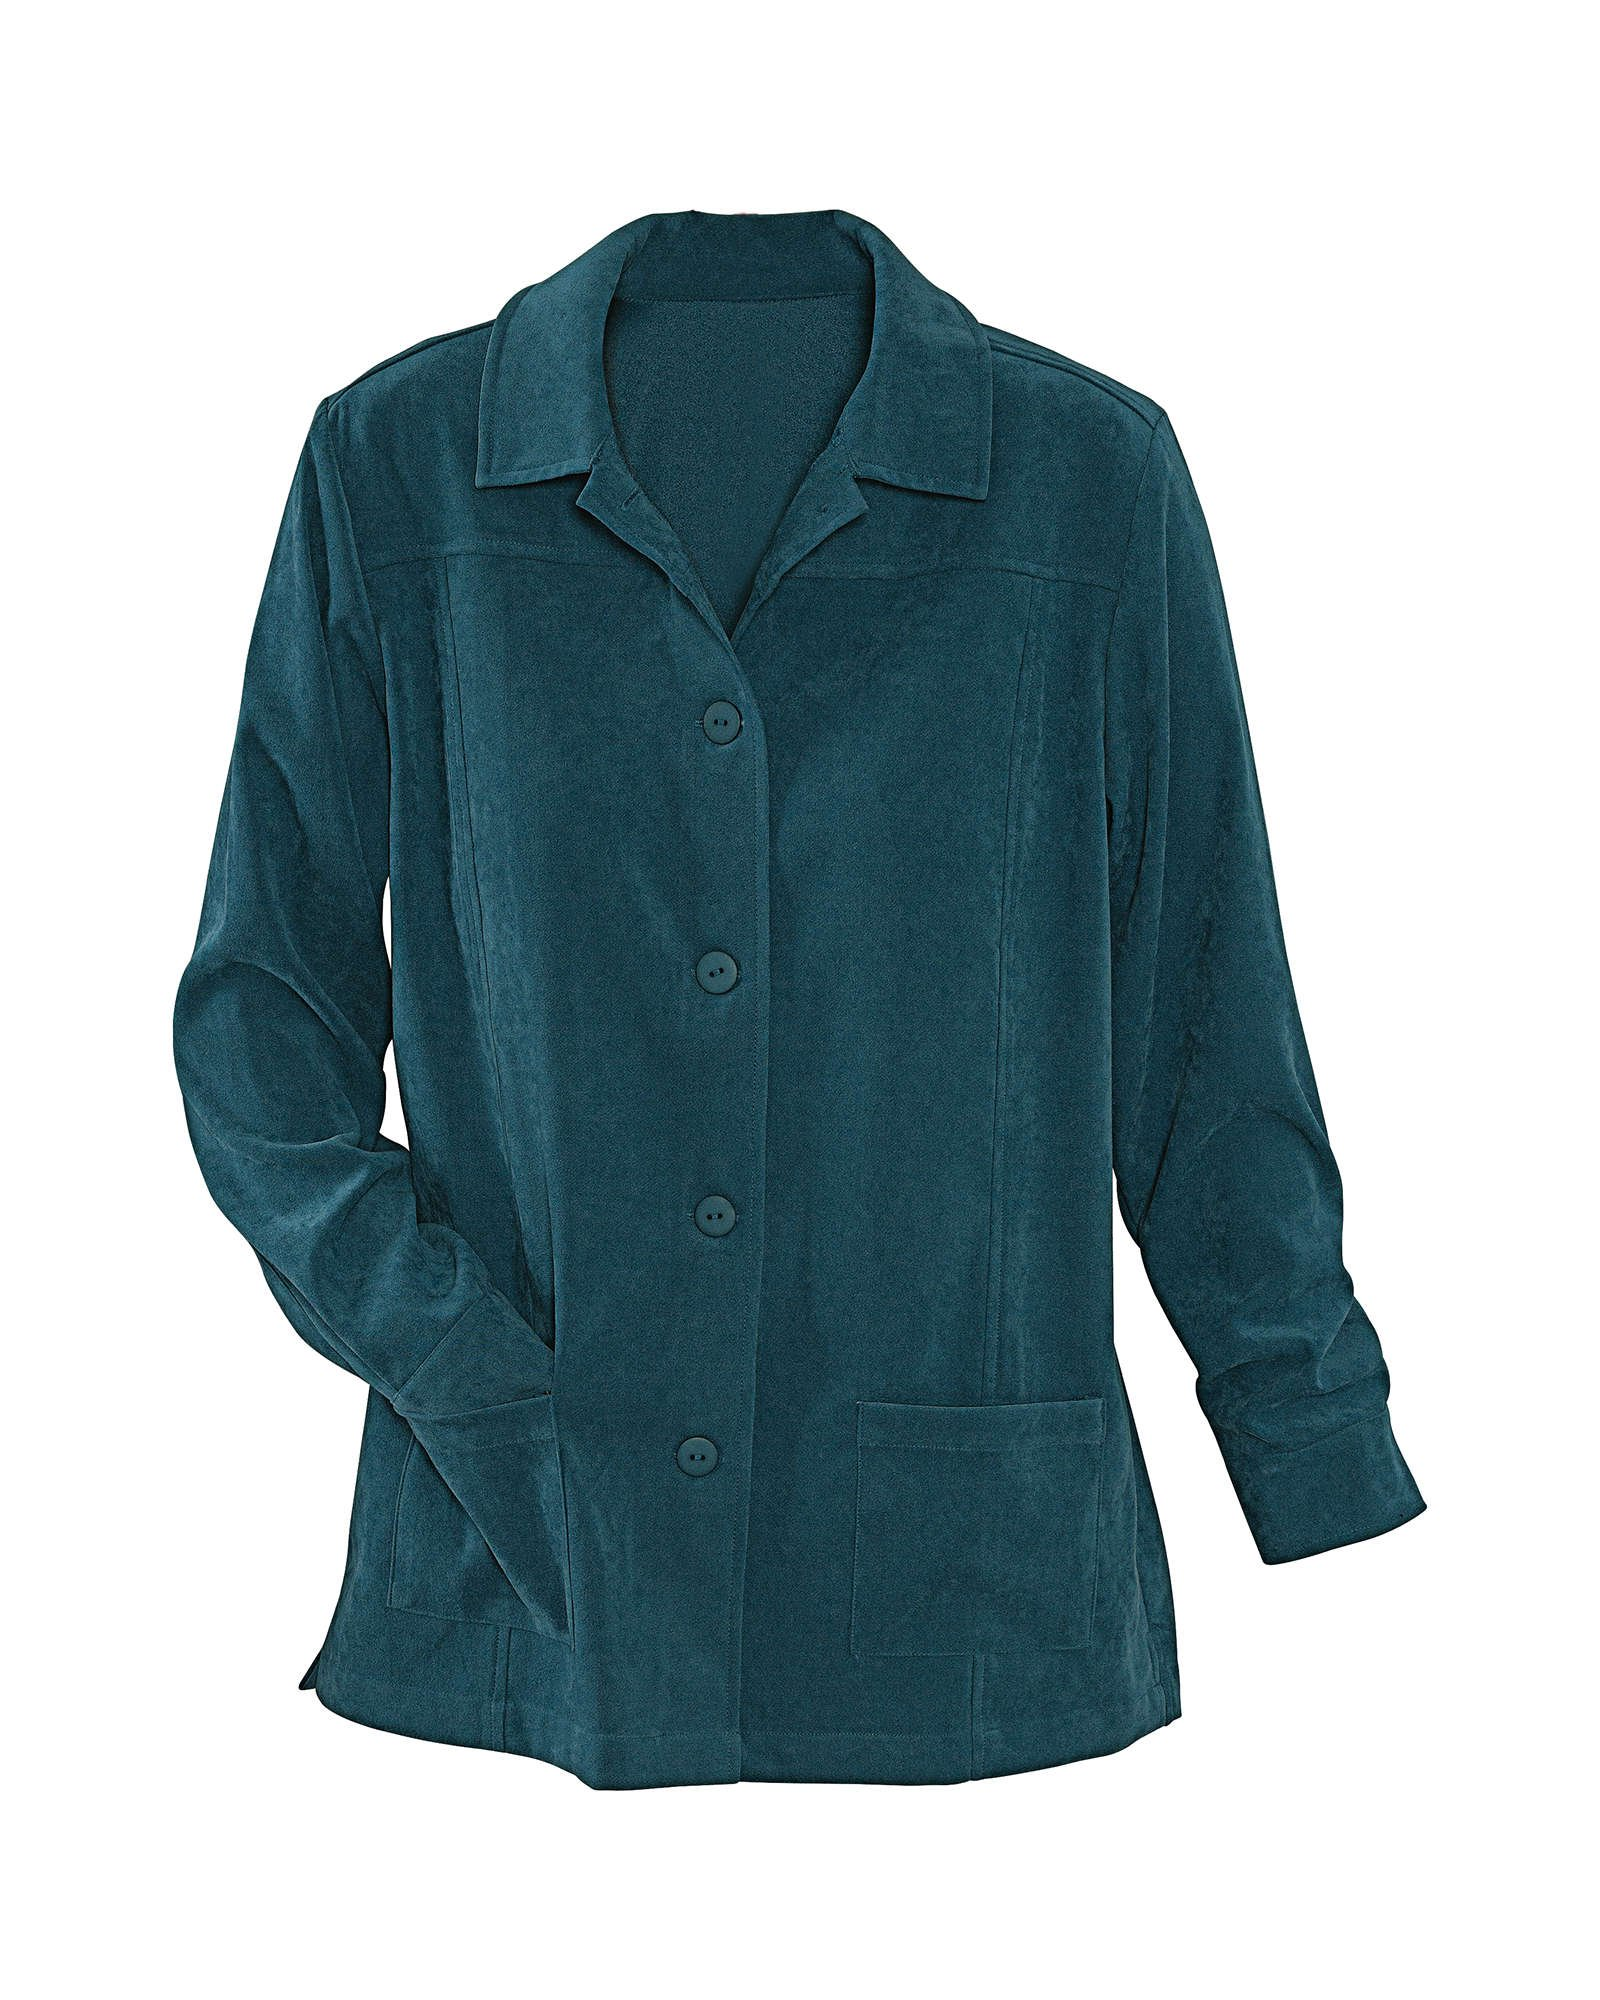 National Faux Suede Shirt Jacket, Dark Teal, Medium